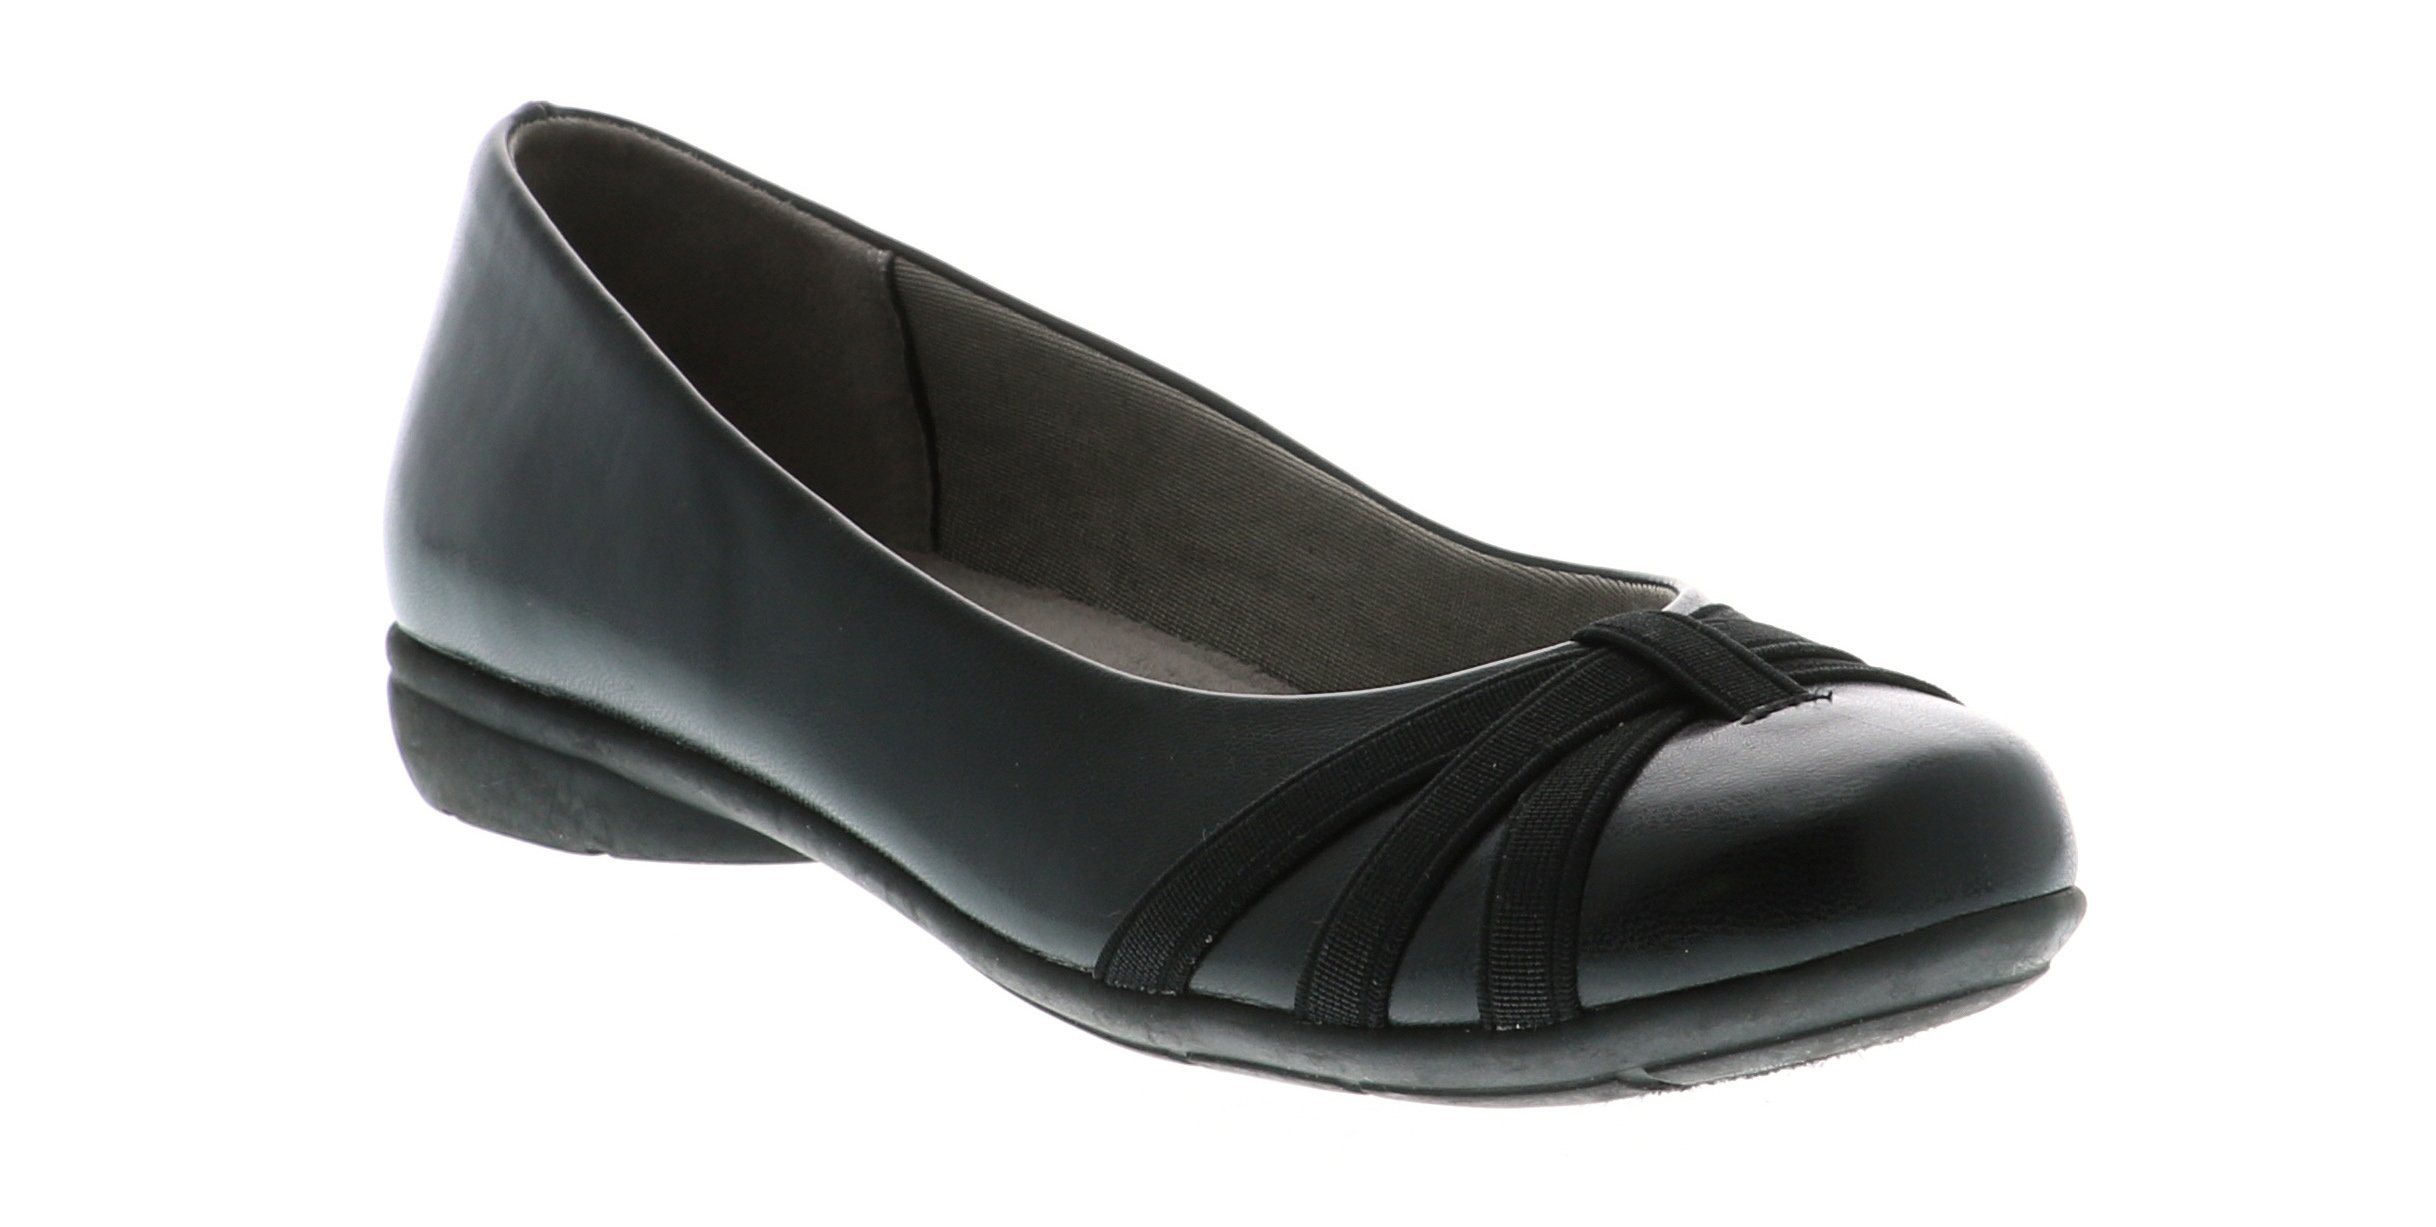 LifeStride Women's Abigail Ballet Flat, Black, 7 M US